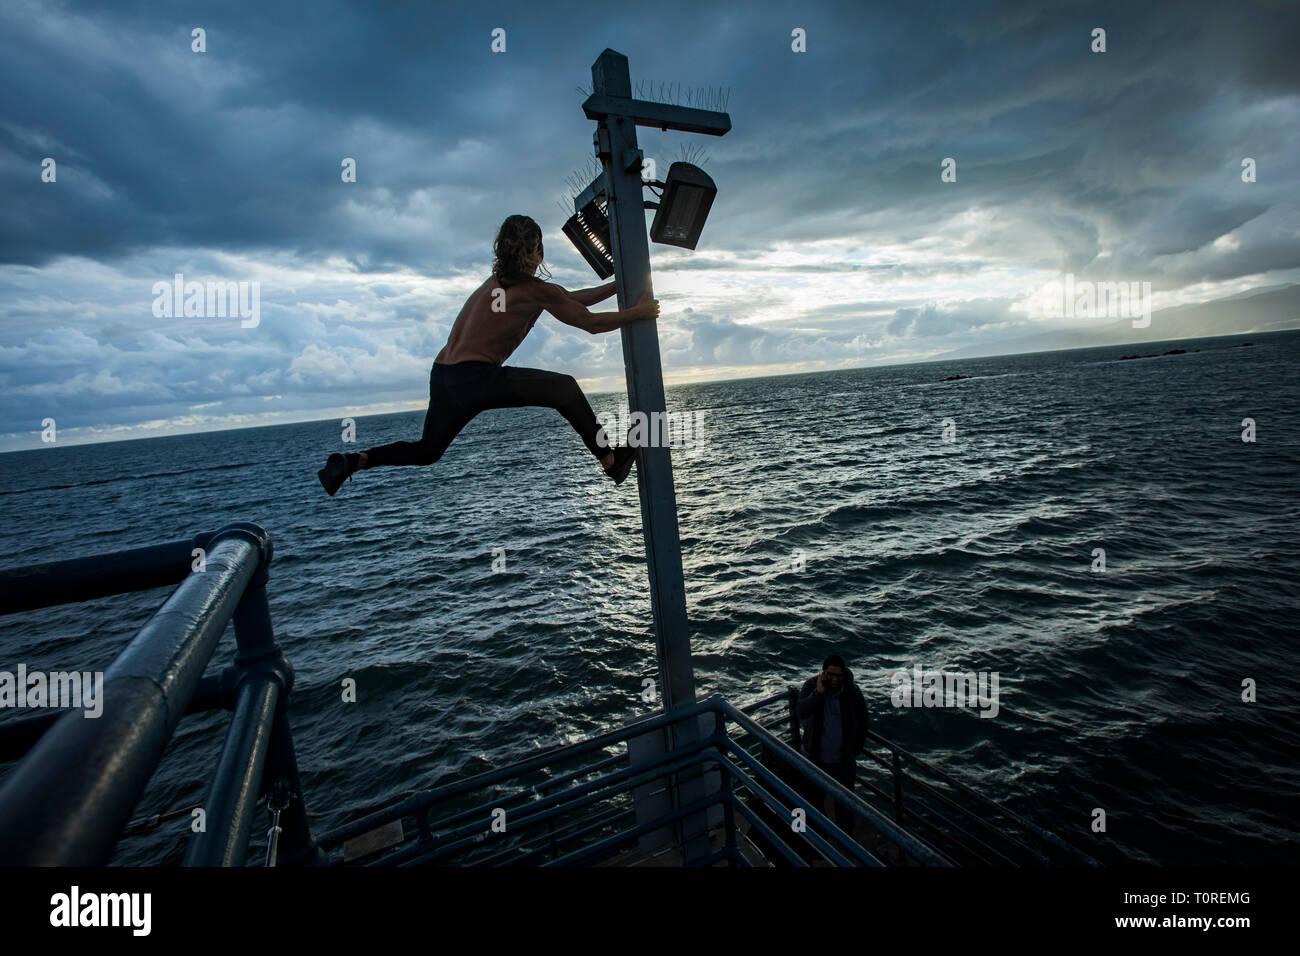 Stuntman /athlete Kane Serafin at the Pier, Santa Monica, Los Angeles, California, USA - Stock Image